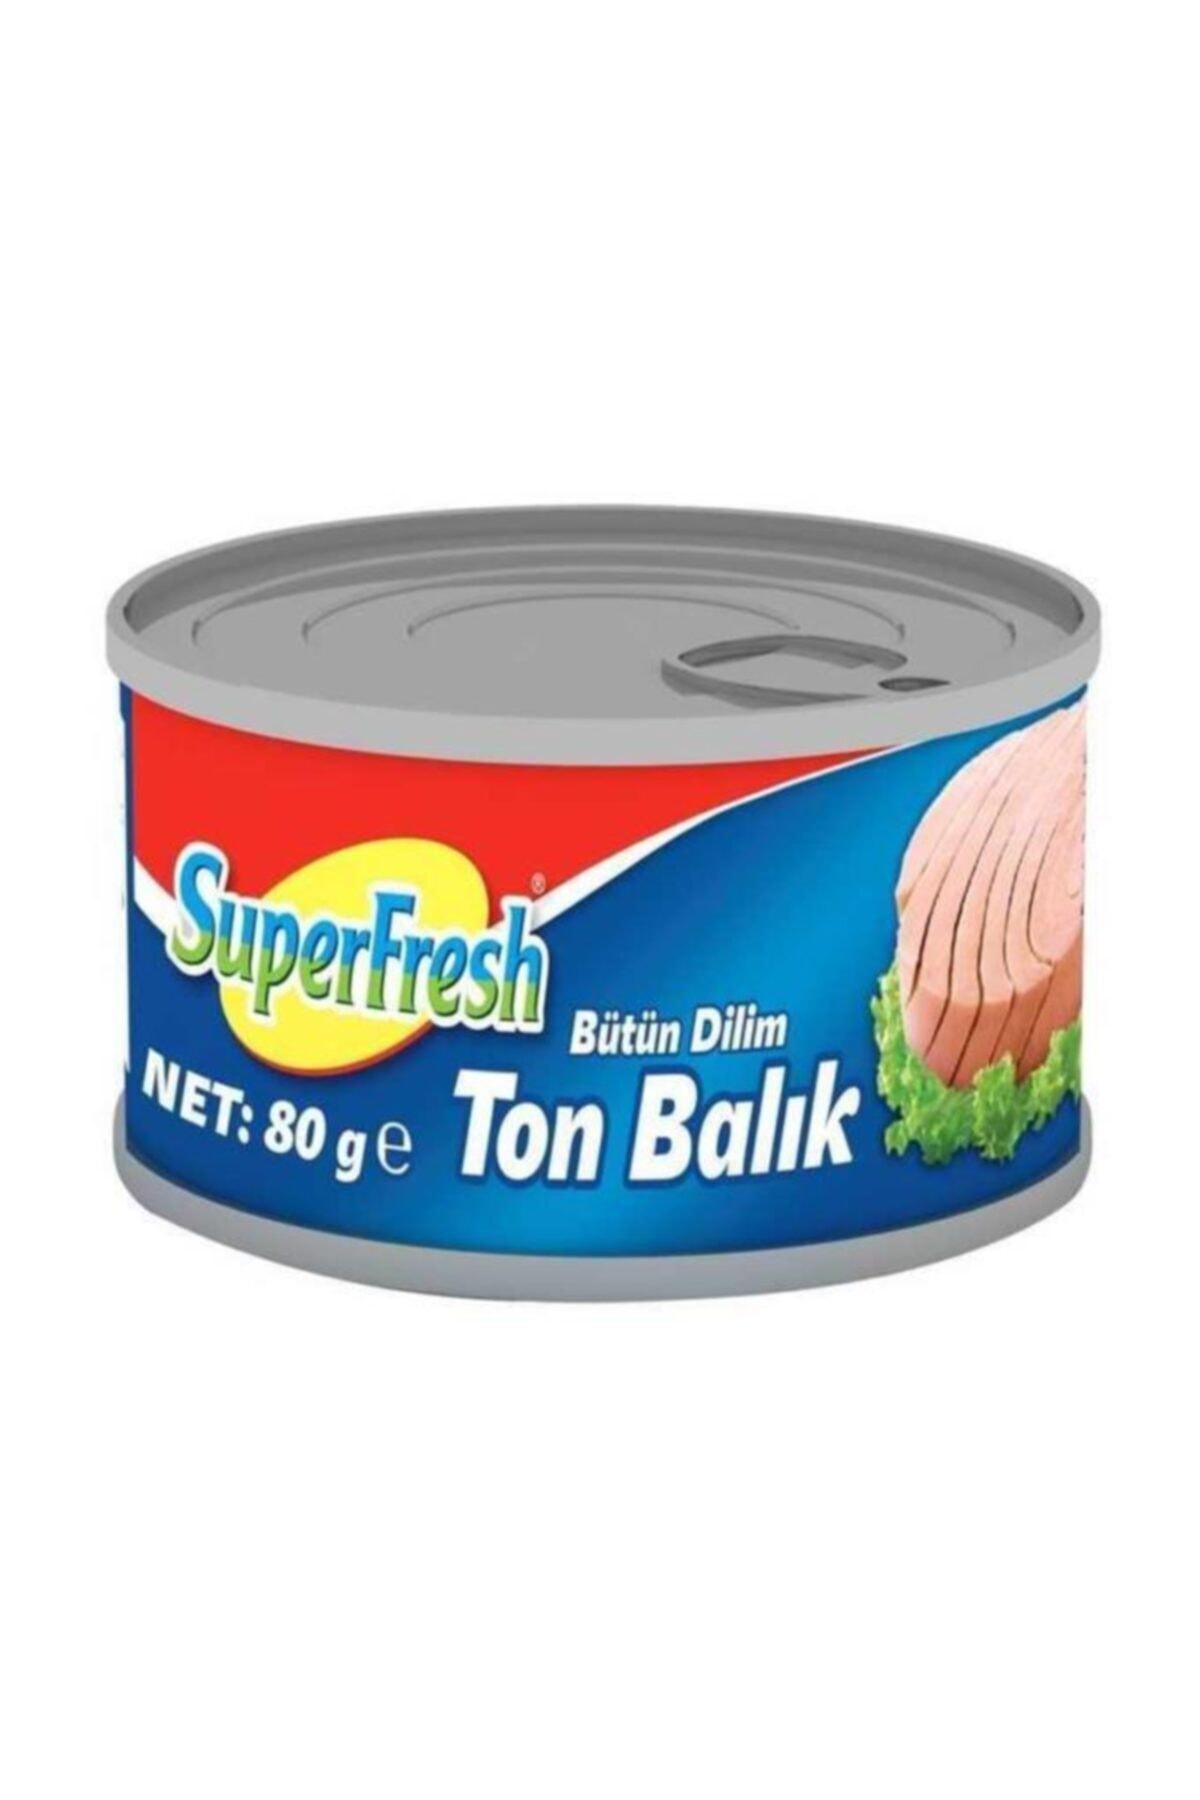 SuperFresh Bütün Dilim Ton Balığı 80 Gr X 24 Adet Skt: 08/2023 2